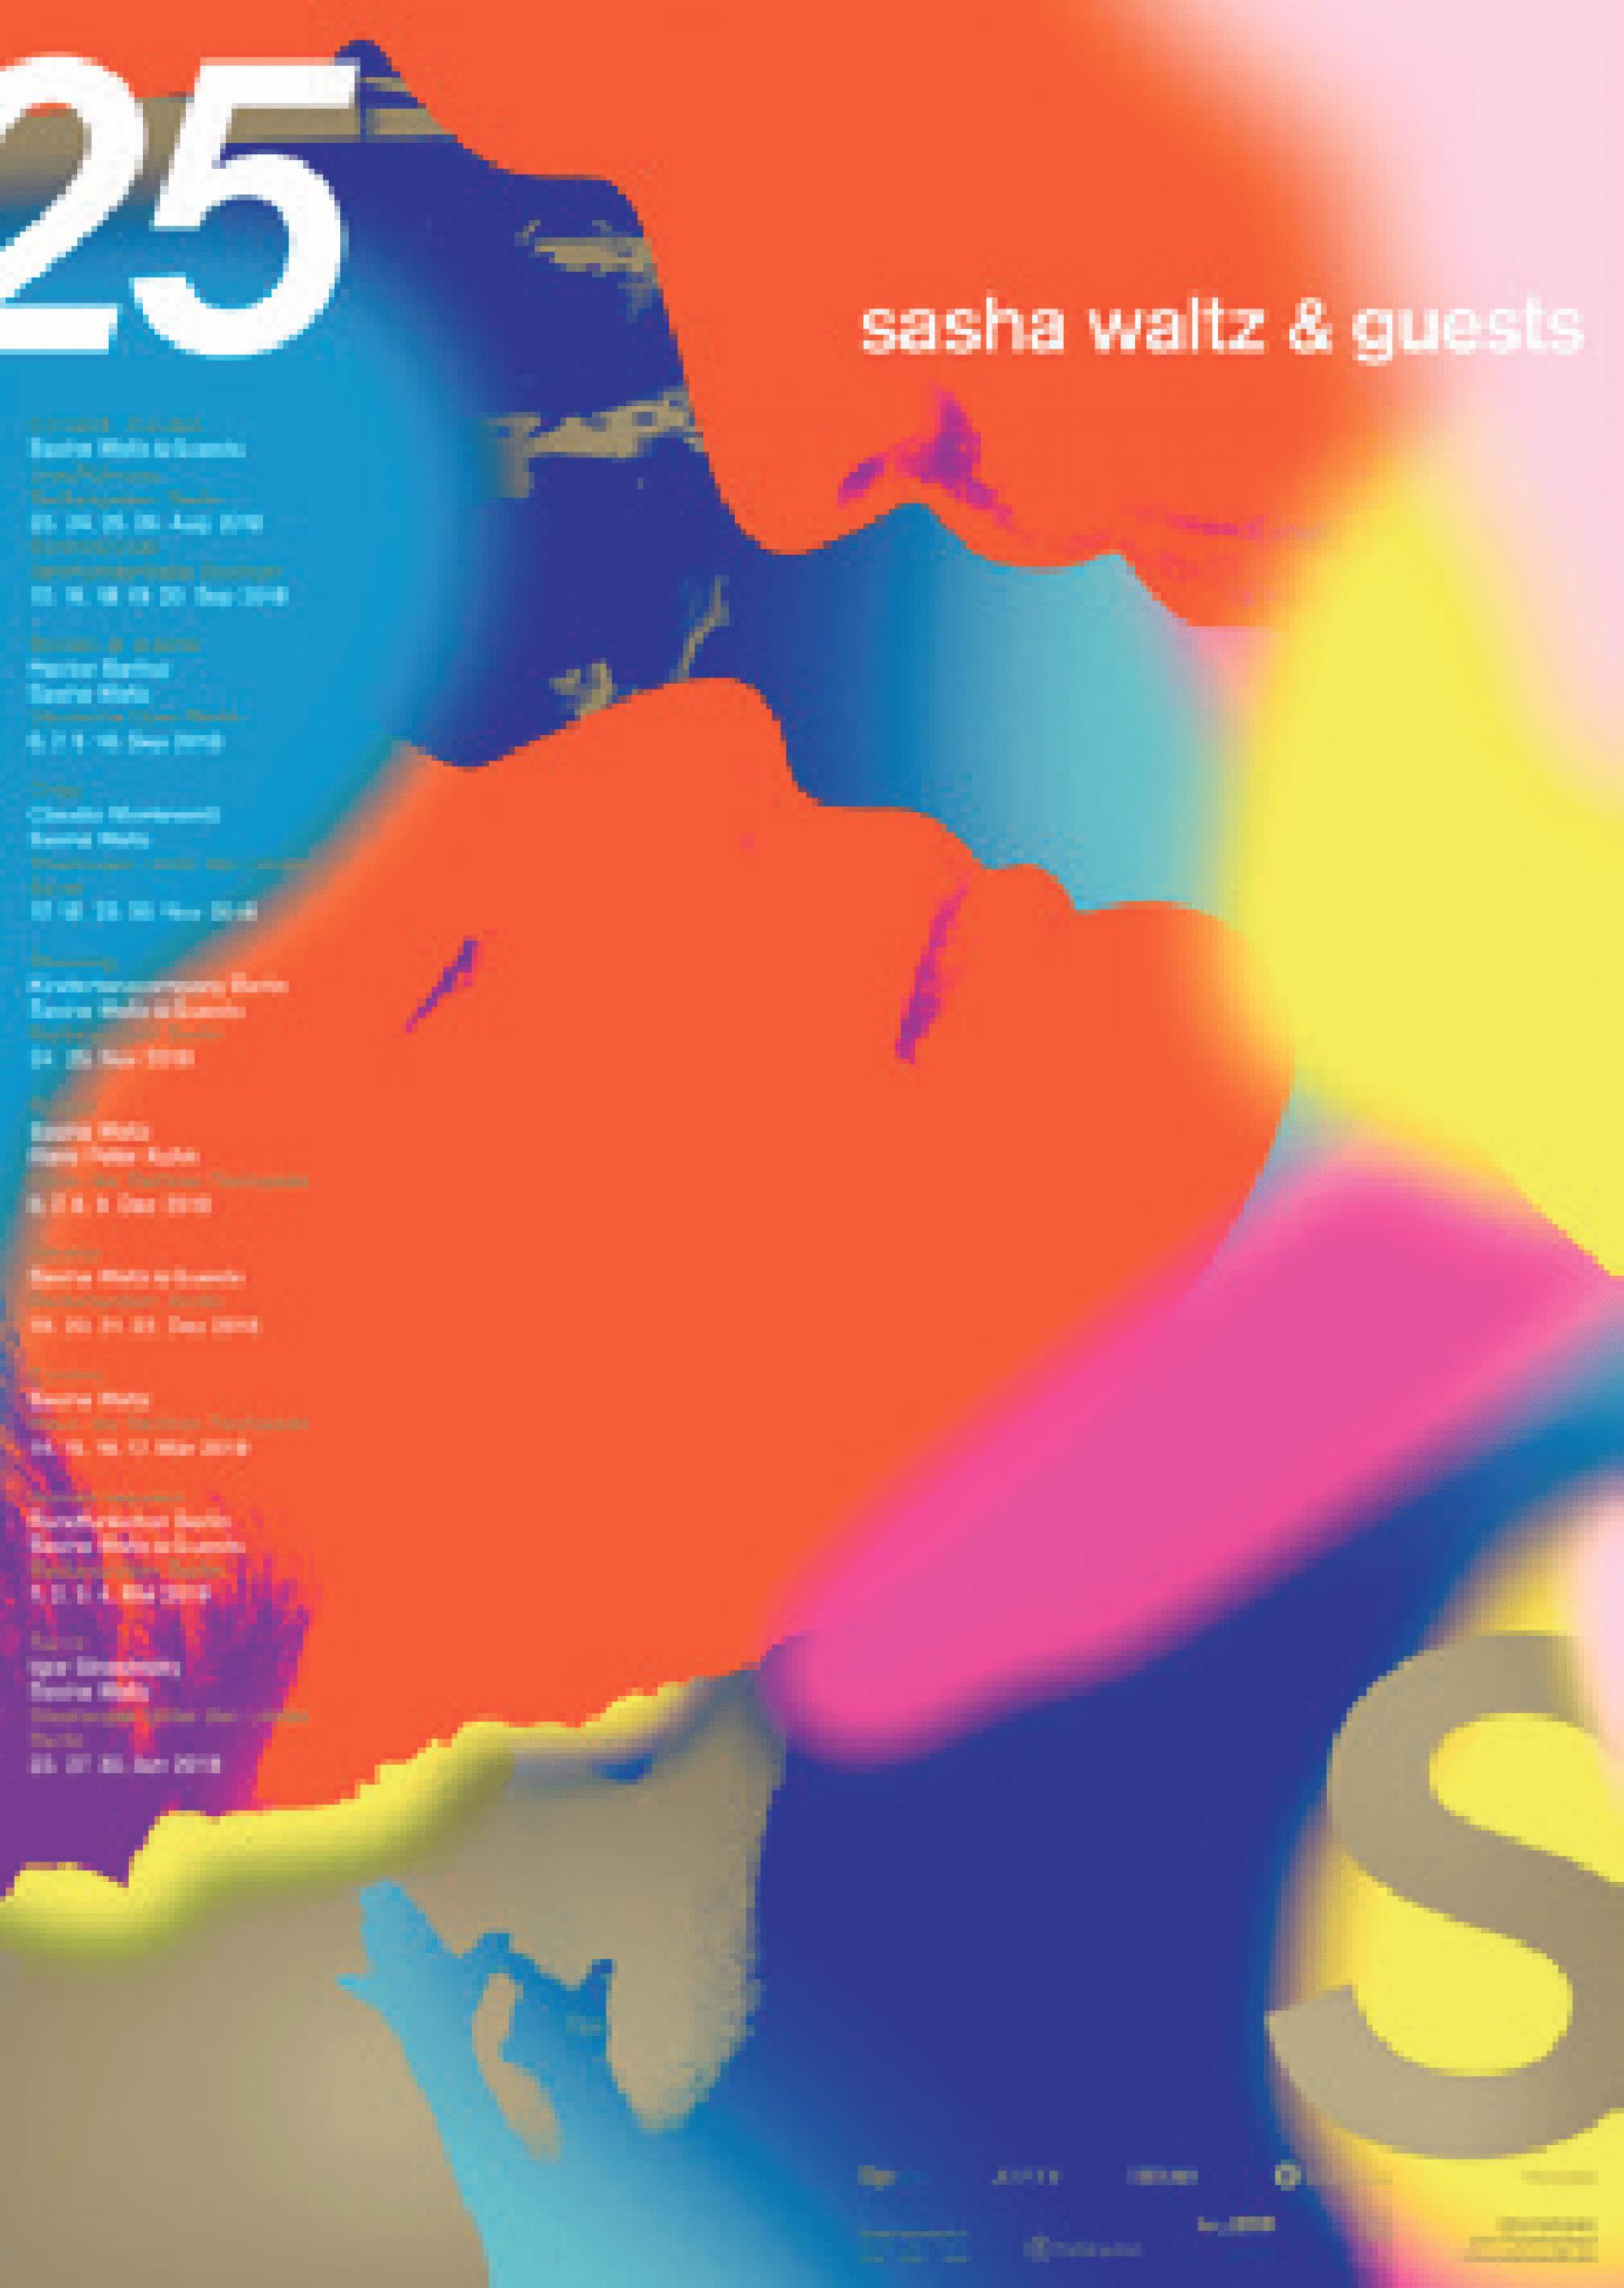 Daniel Wiesmann (Berlin) 25 Jahre Sasha Waltz & Guests Plakat (Siebdruck), 2018 © Daniel Wiesmann / 100 Beste Plakate e. V.